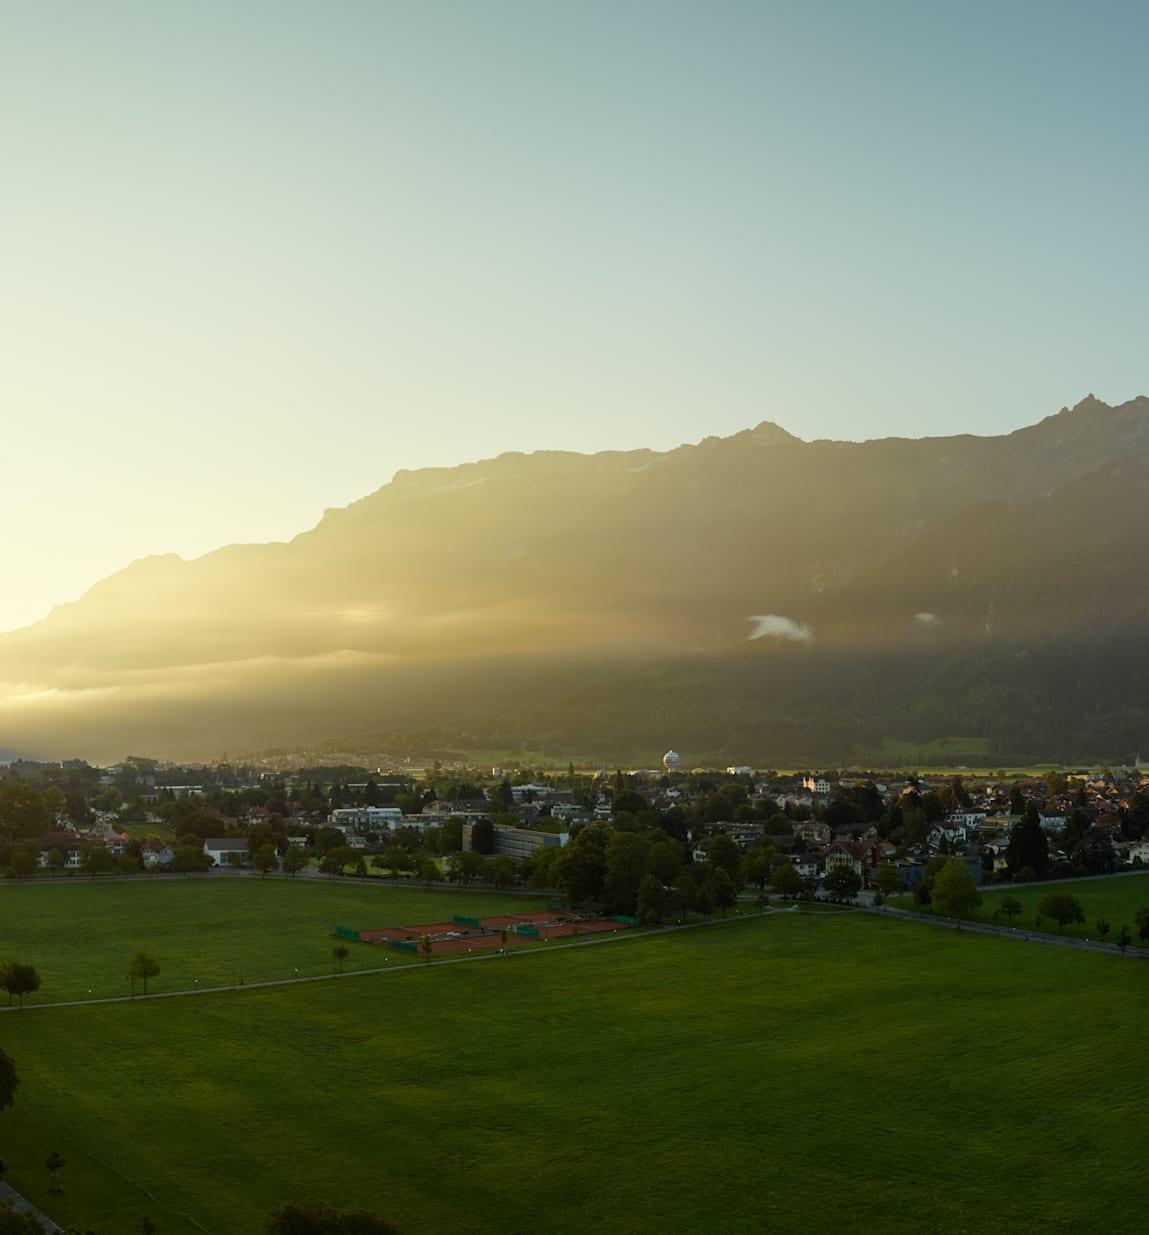 Interlaken Jungfrau Sonnenaufgang Sommer